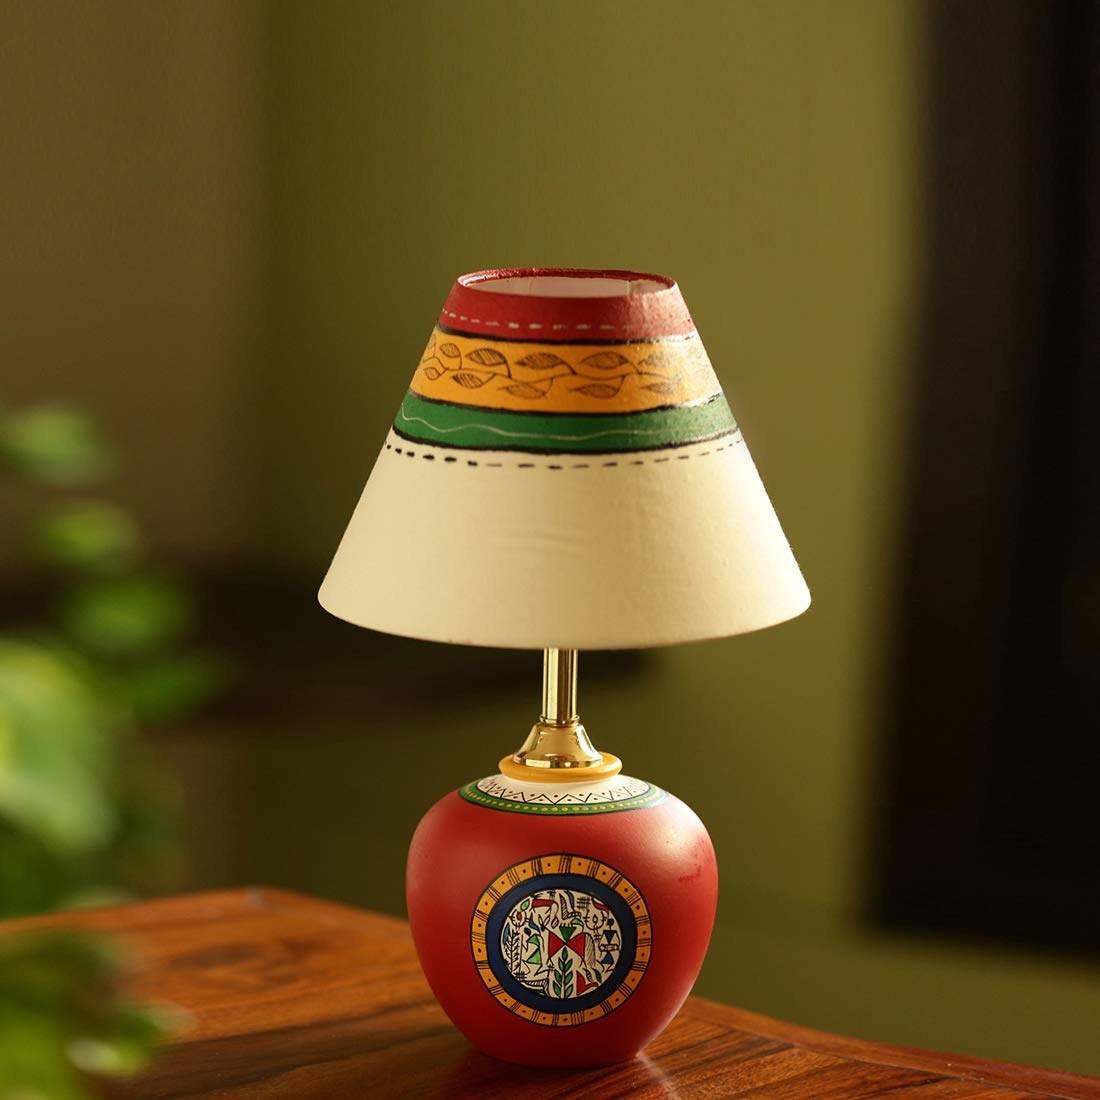 A red terracotta lamp